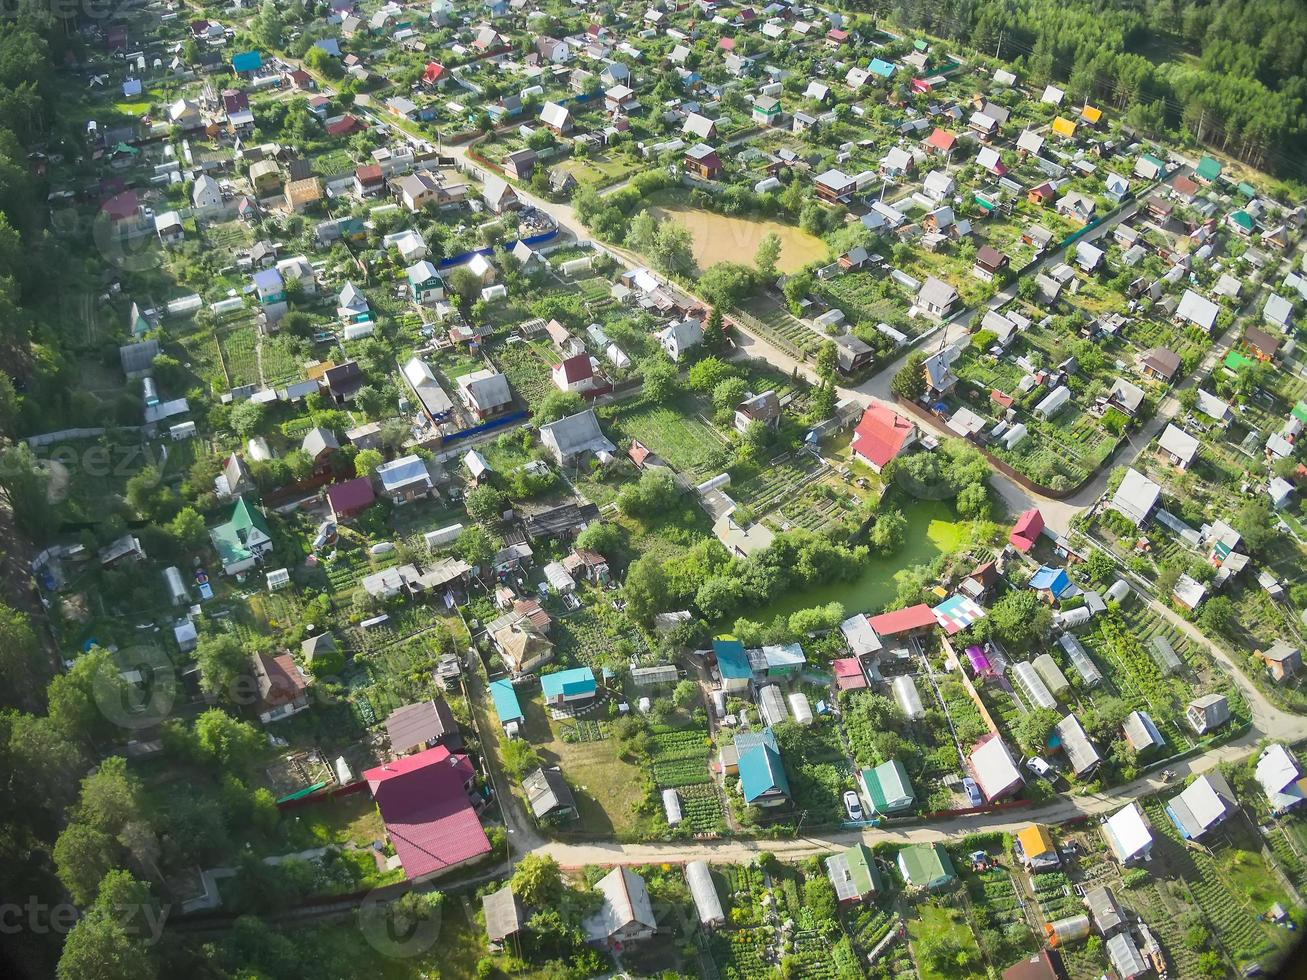 Bird's eye view of housing estate photo